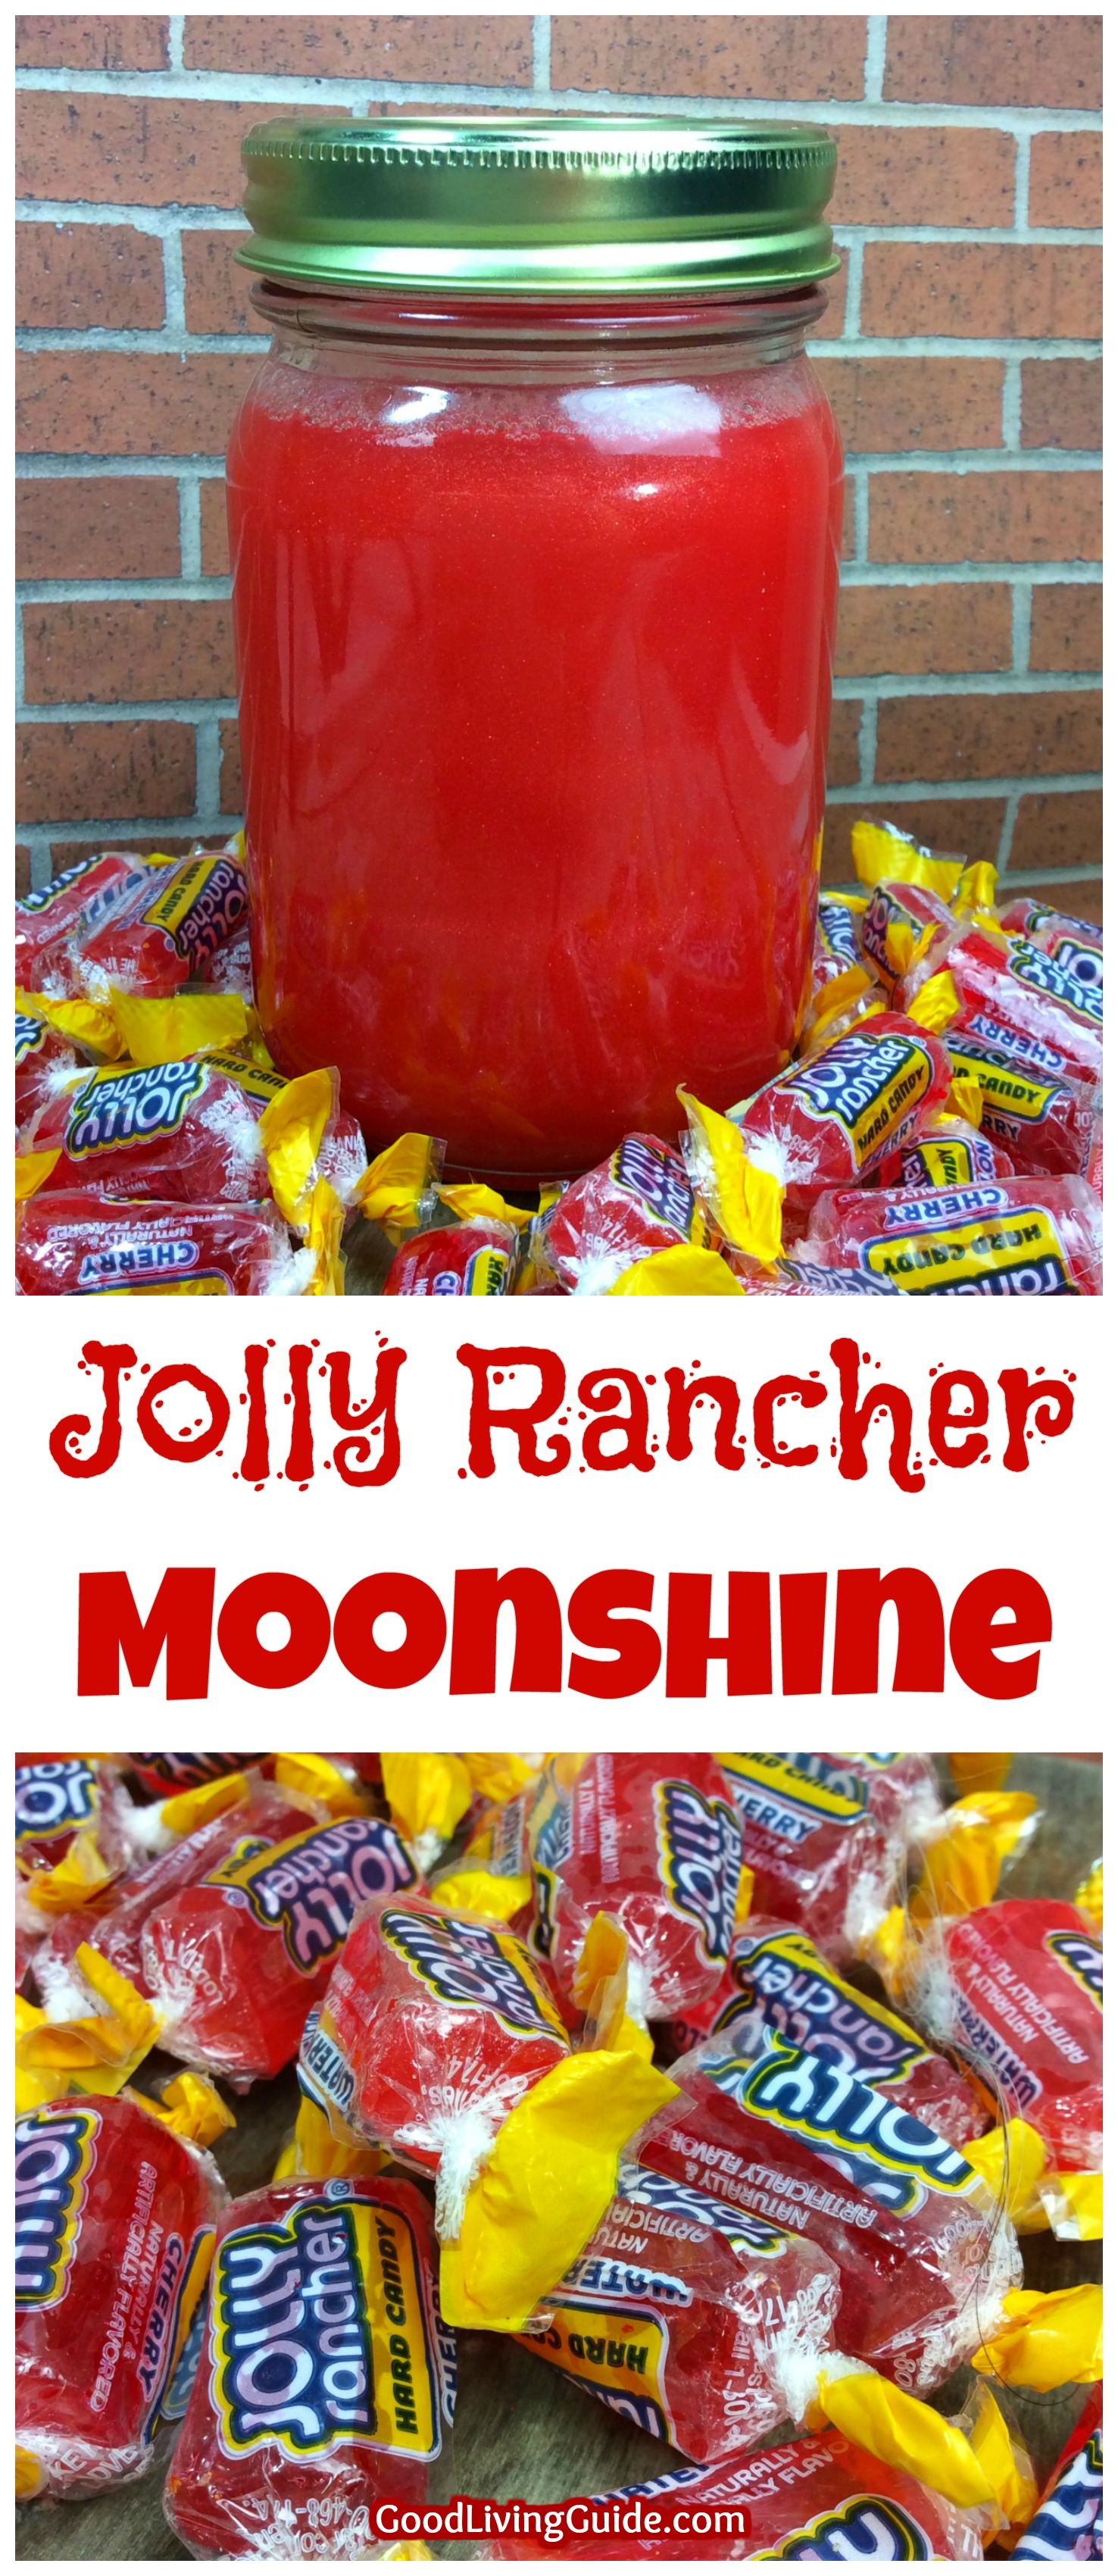 Jolly Rancher Moonshine